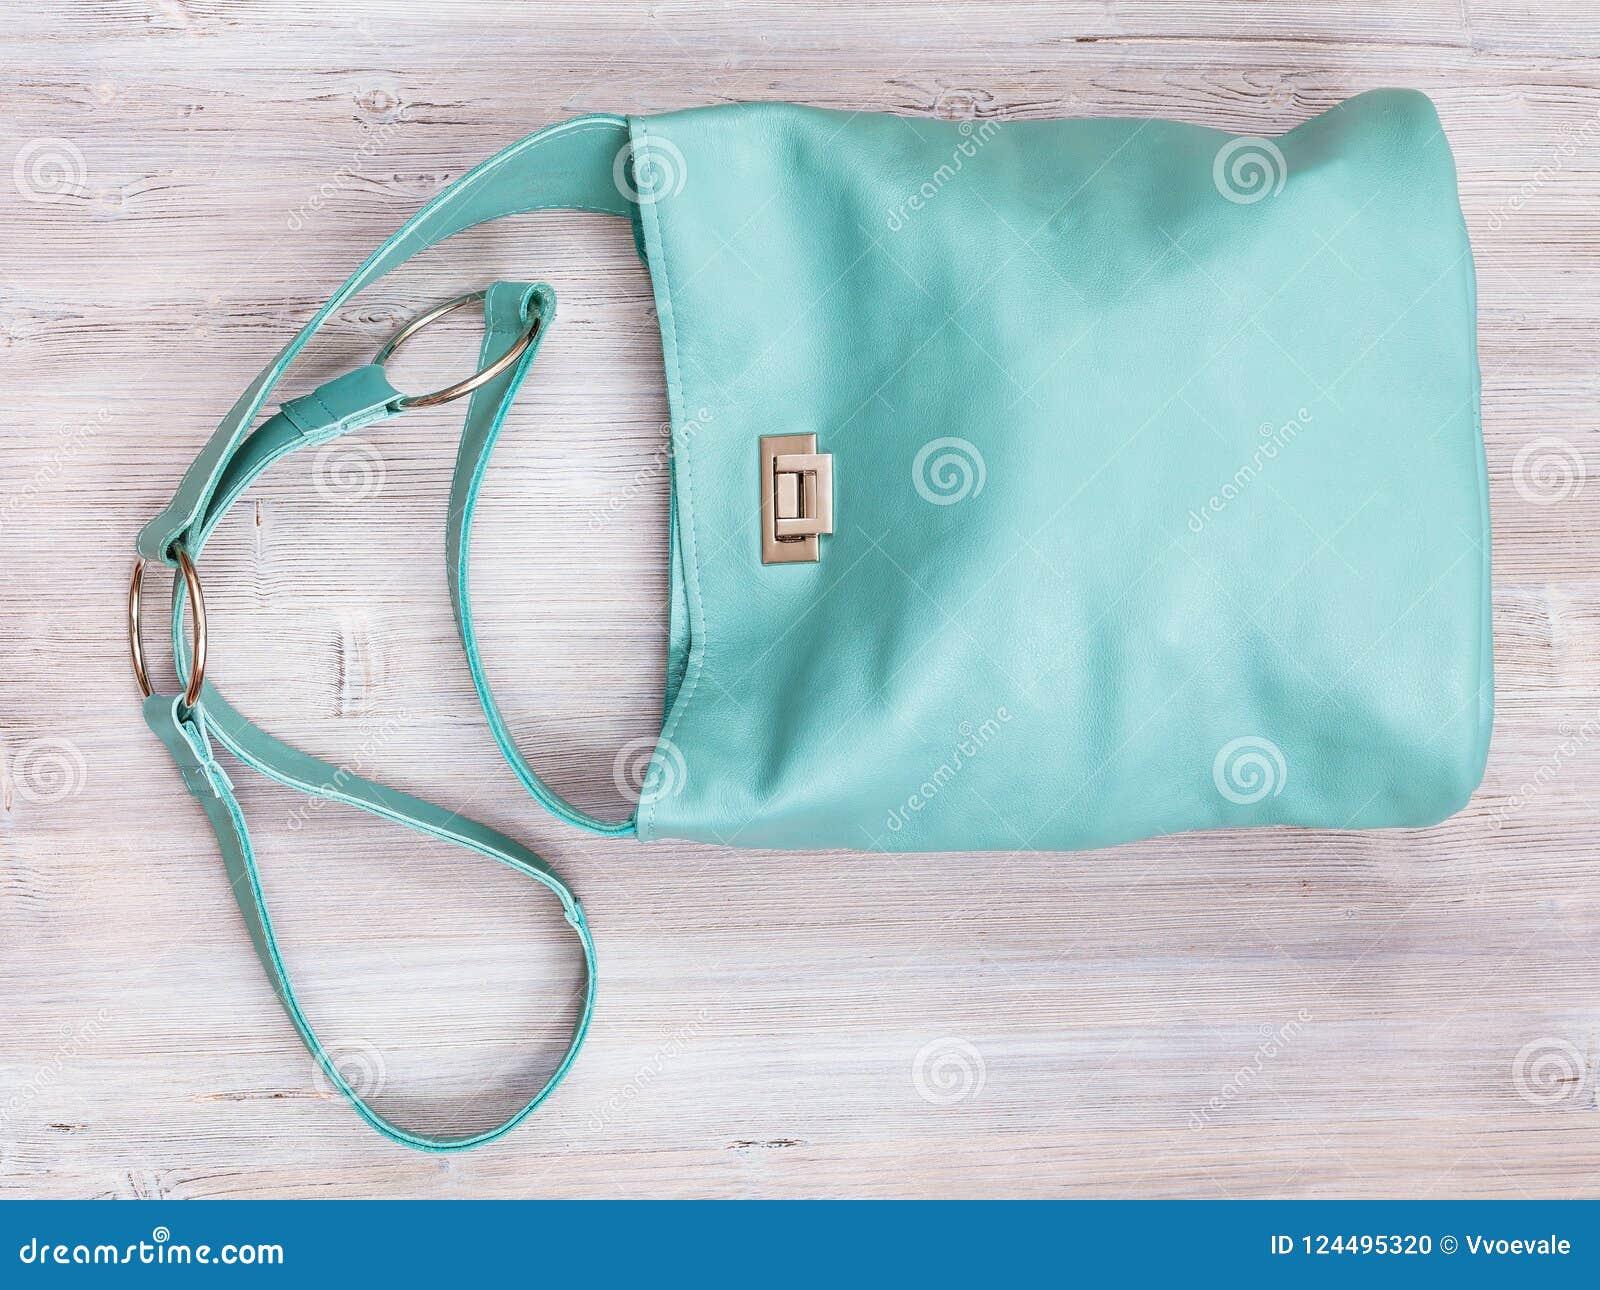 69ed4959c6 Χειροποίητη τυρκουάζ Crossbody τσάντα δέρματος χρώματος Στοκ Εικόνες ...